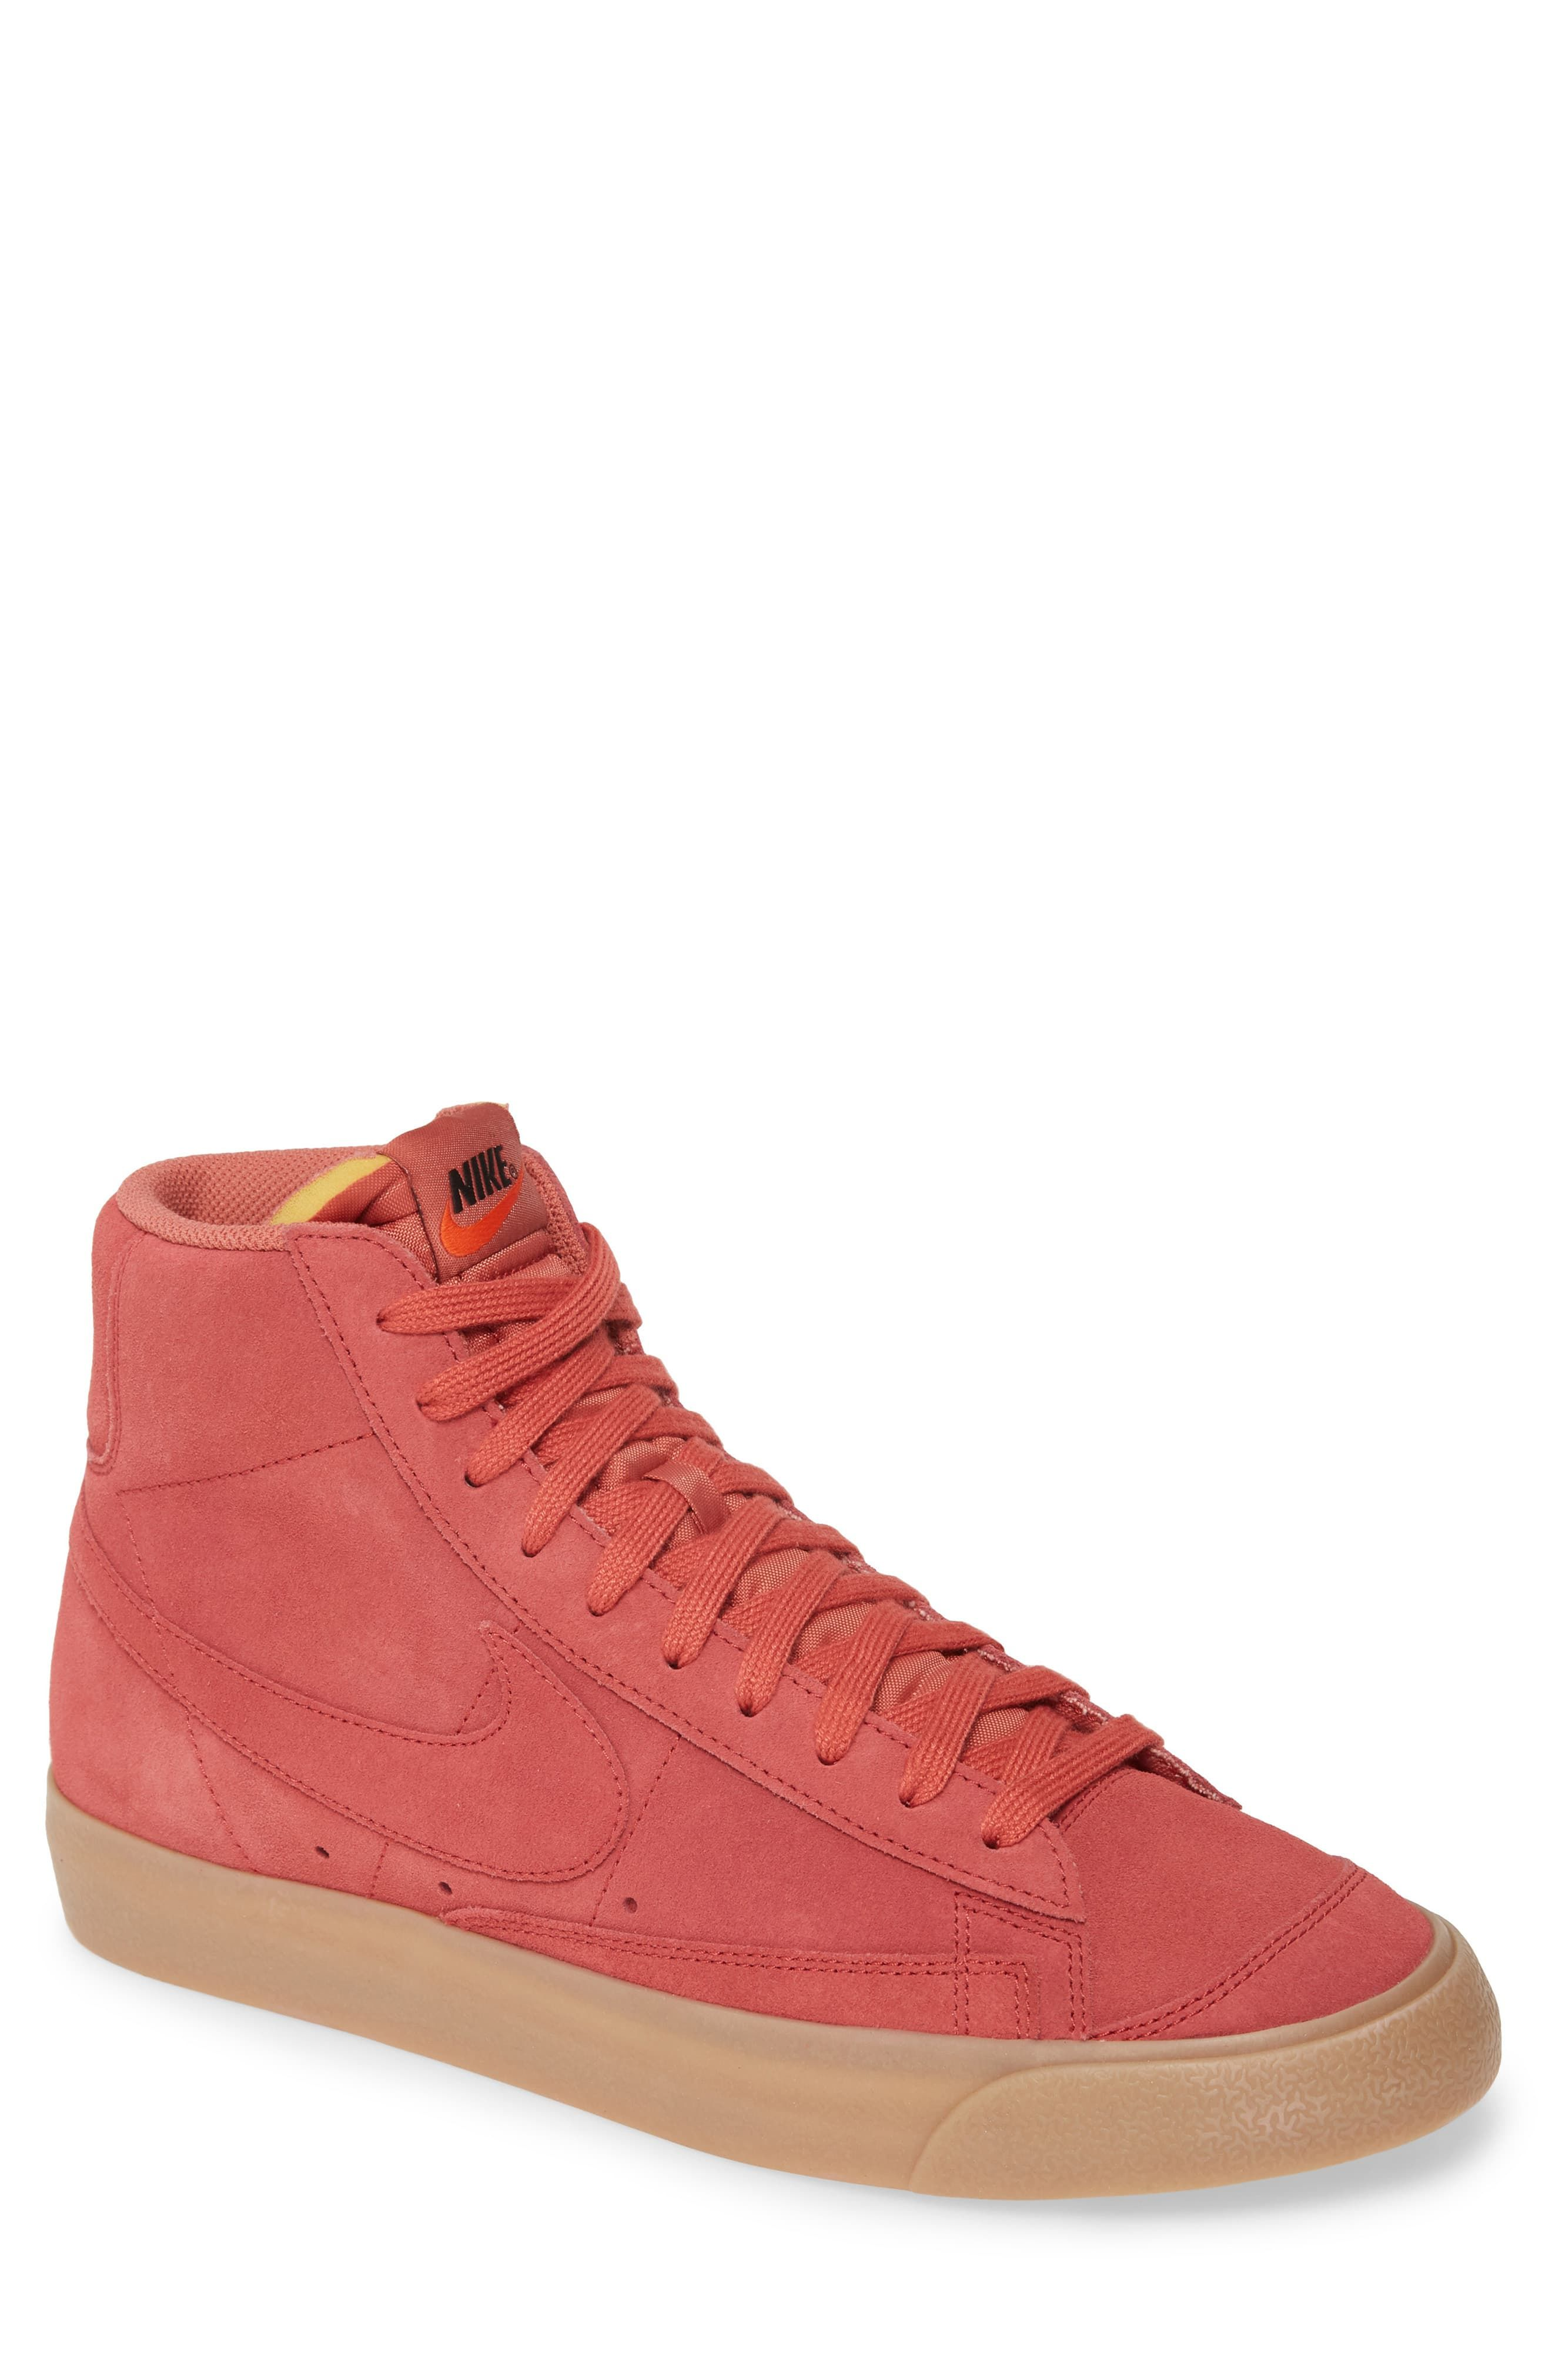 Nike Blazer Mid '77 Suede Sneaker, Size 10.5 M Red in 2020